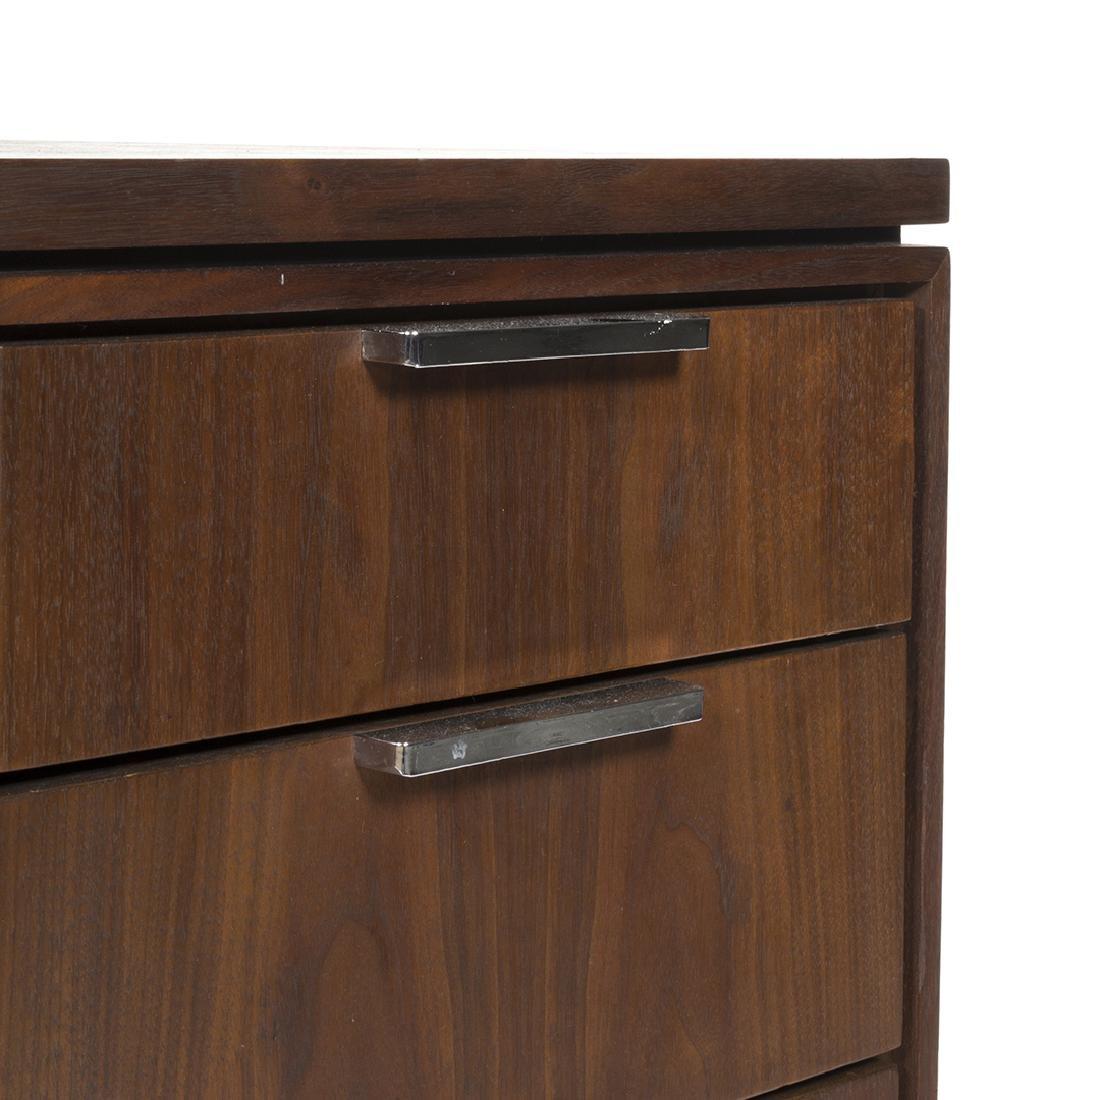 Walnut and Chrome Desk - 3